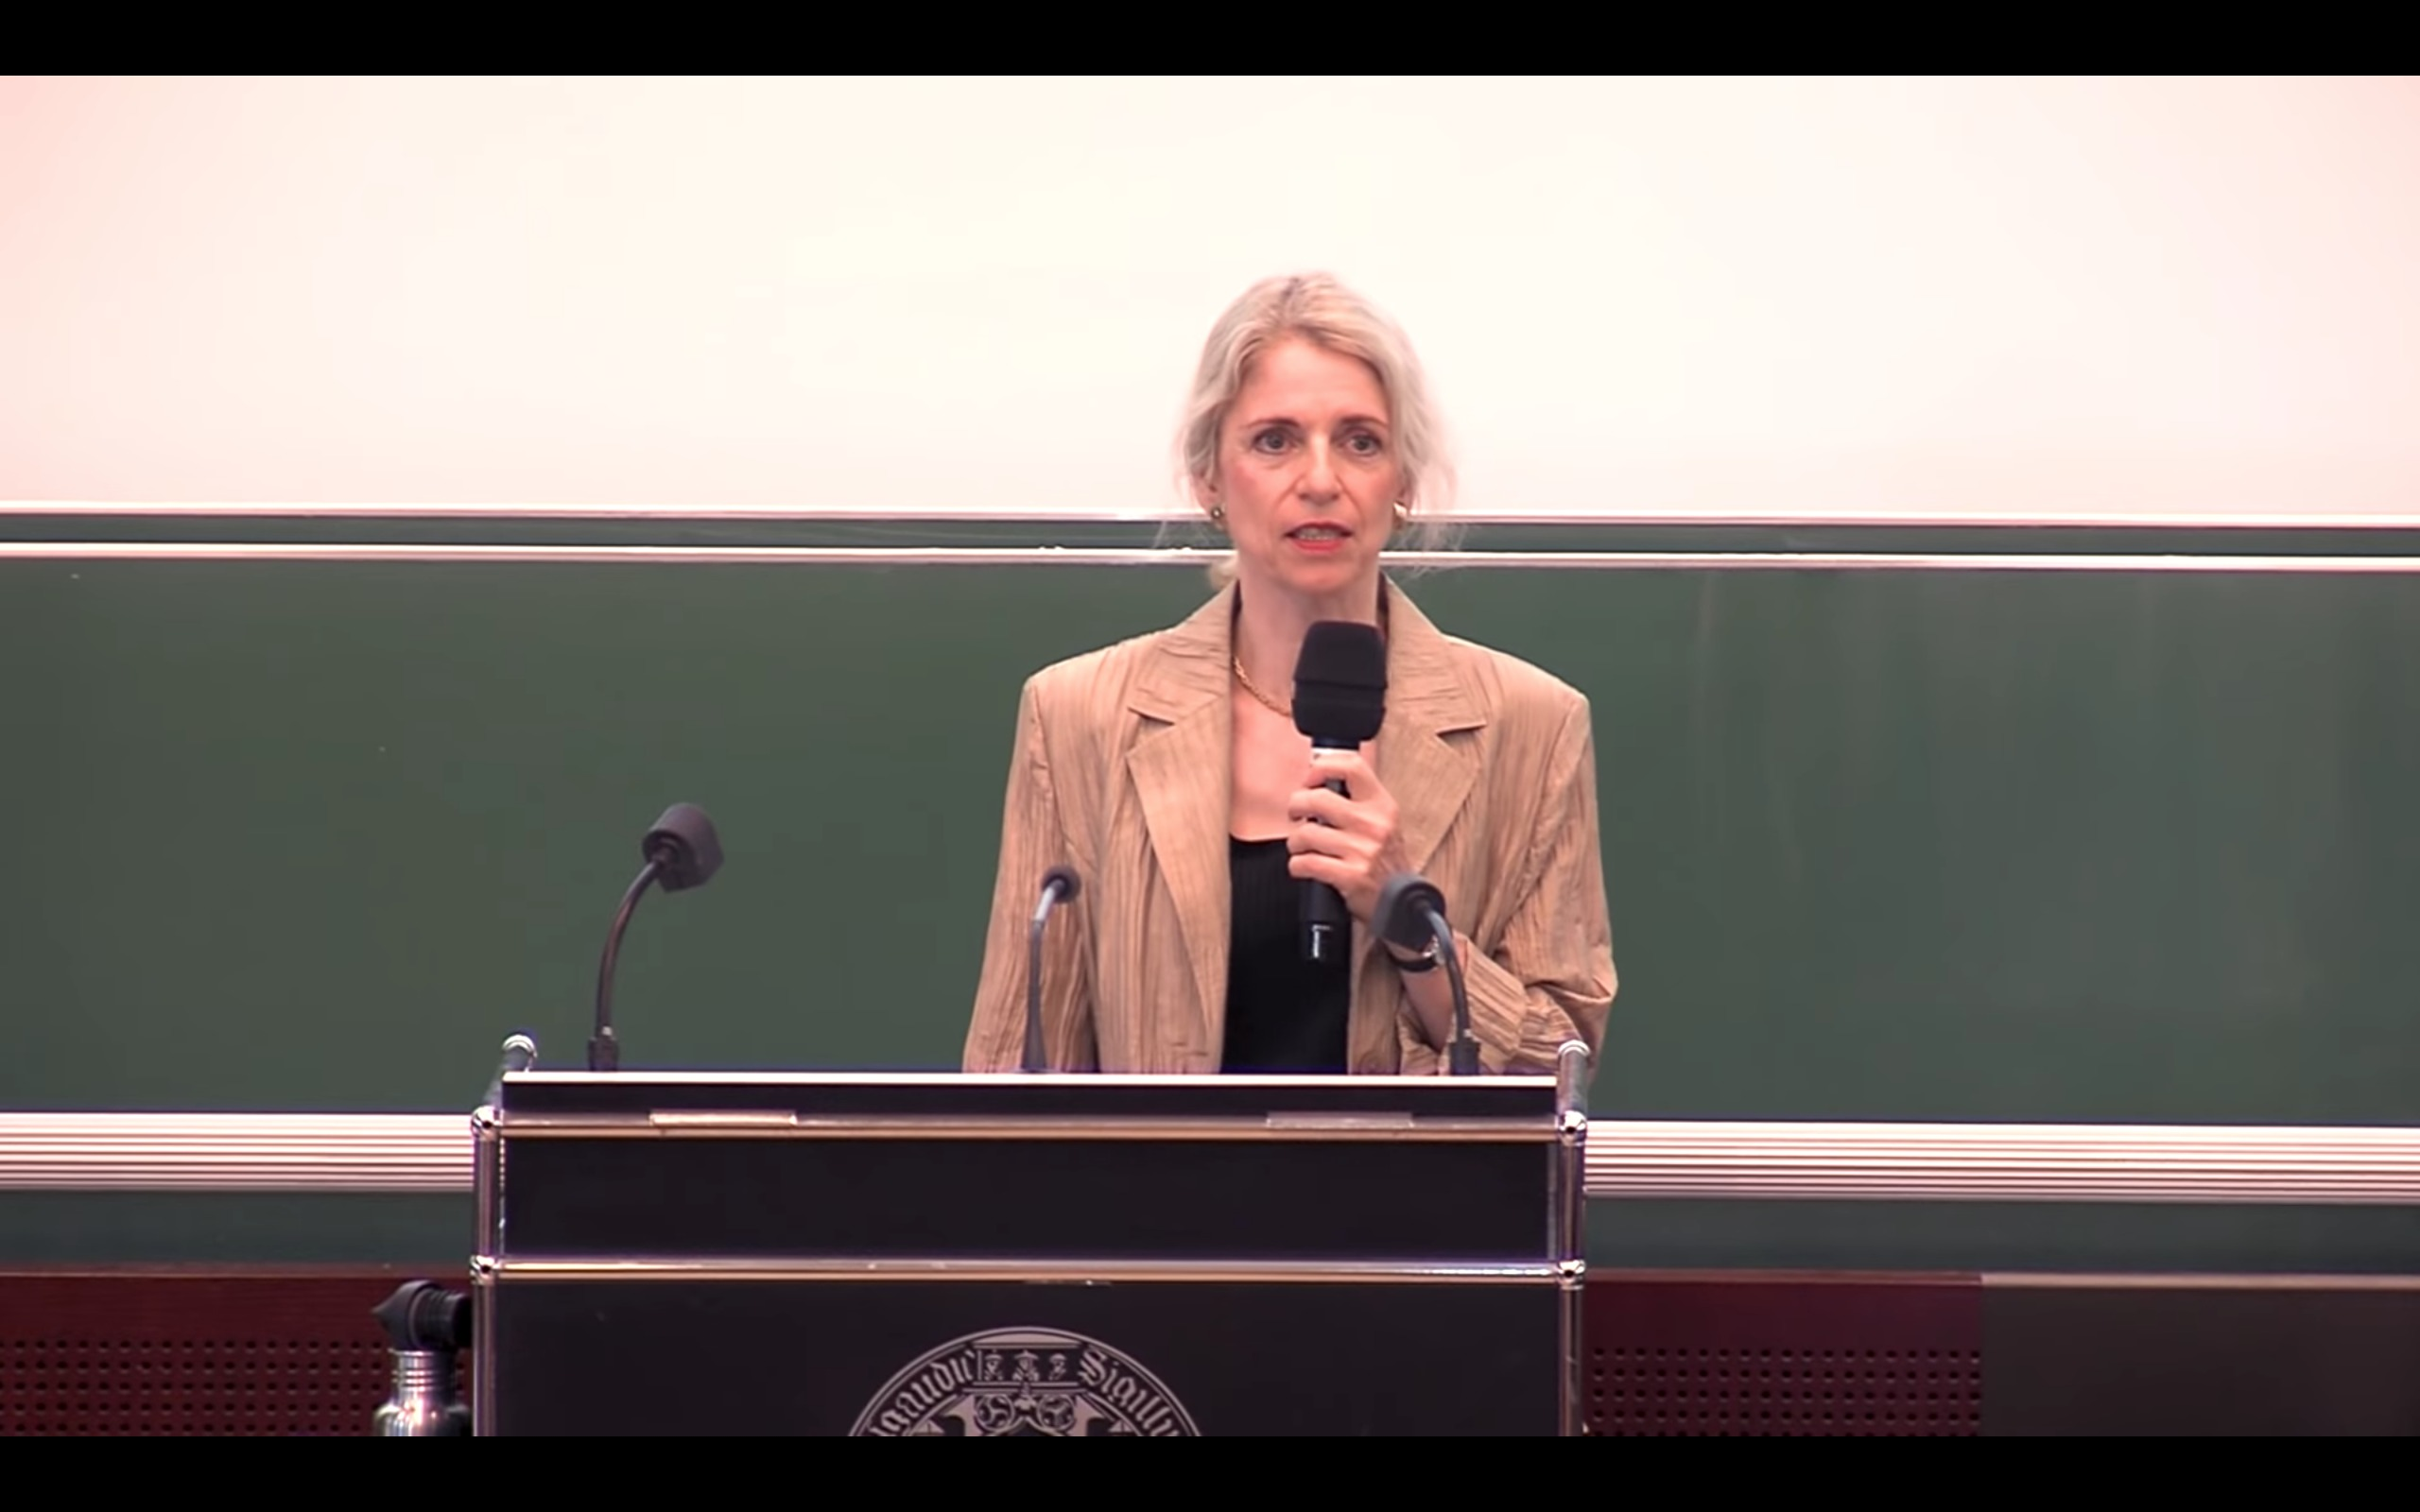 La Dr. Michels durante su conferencia